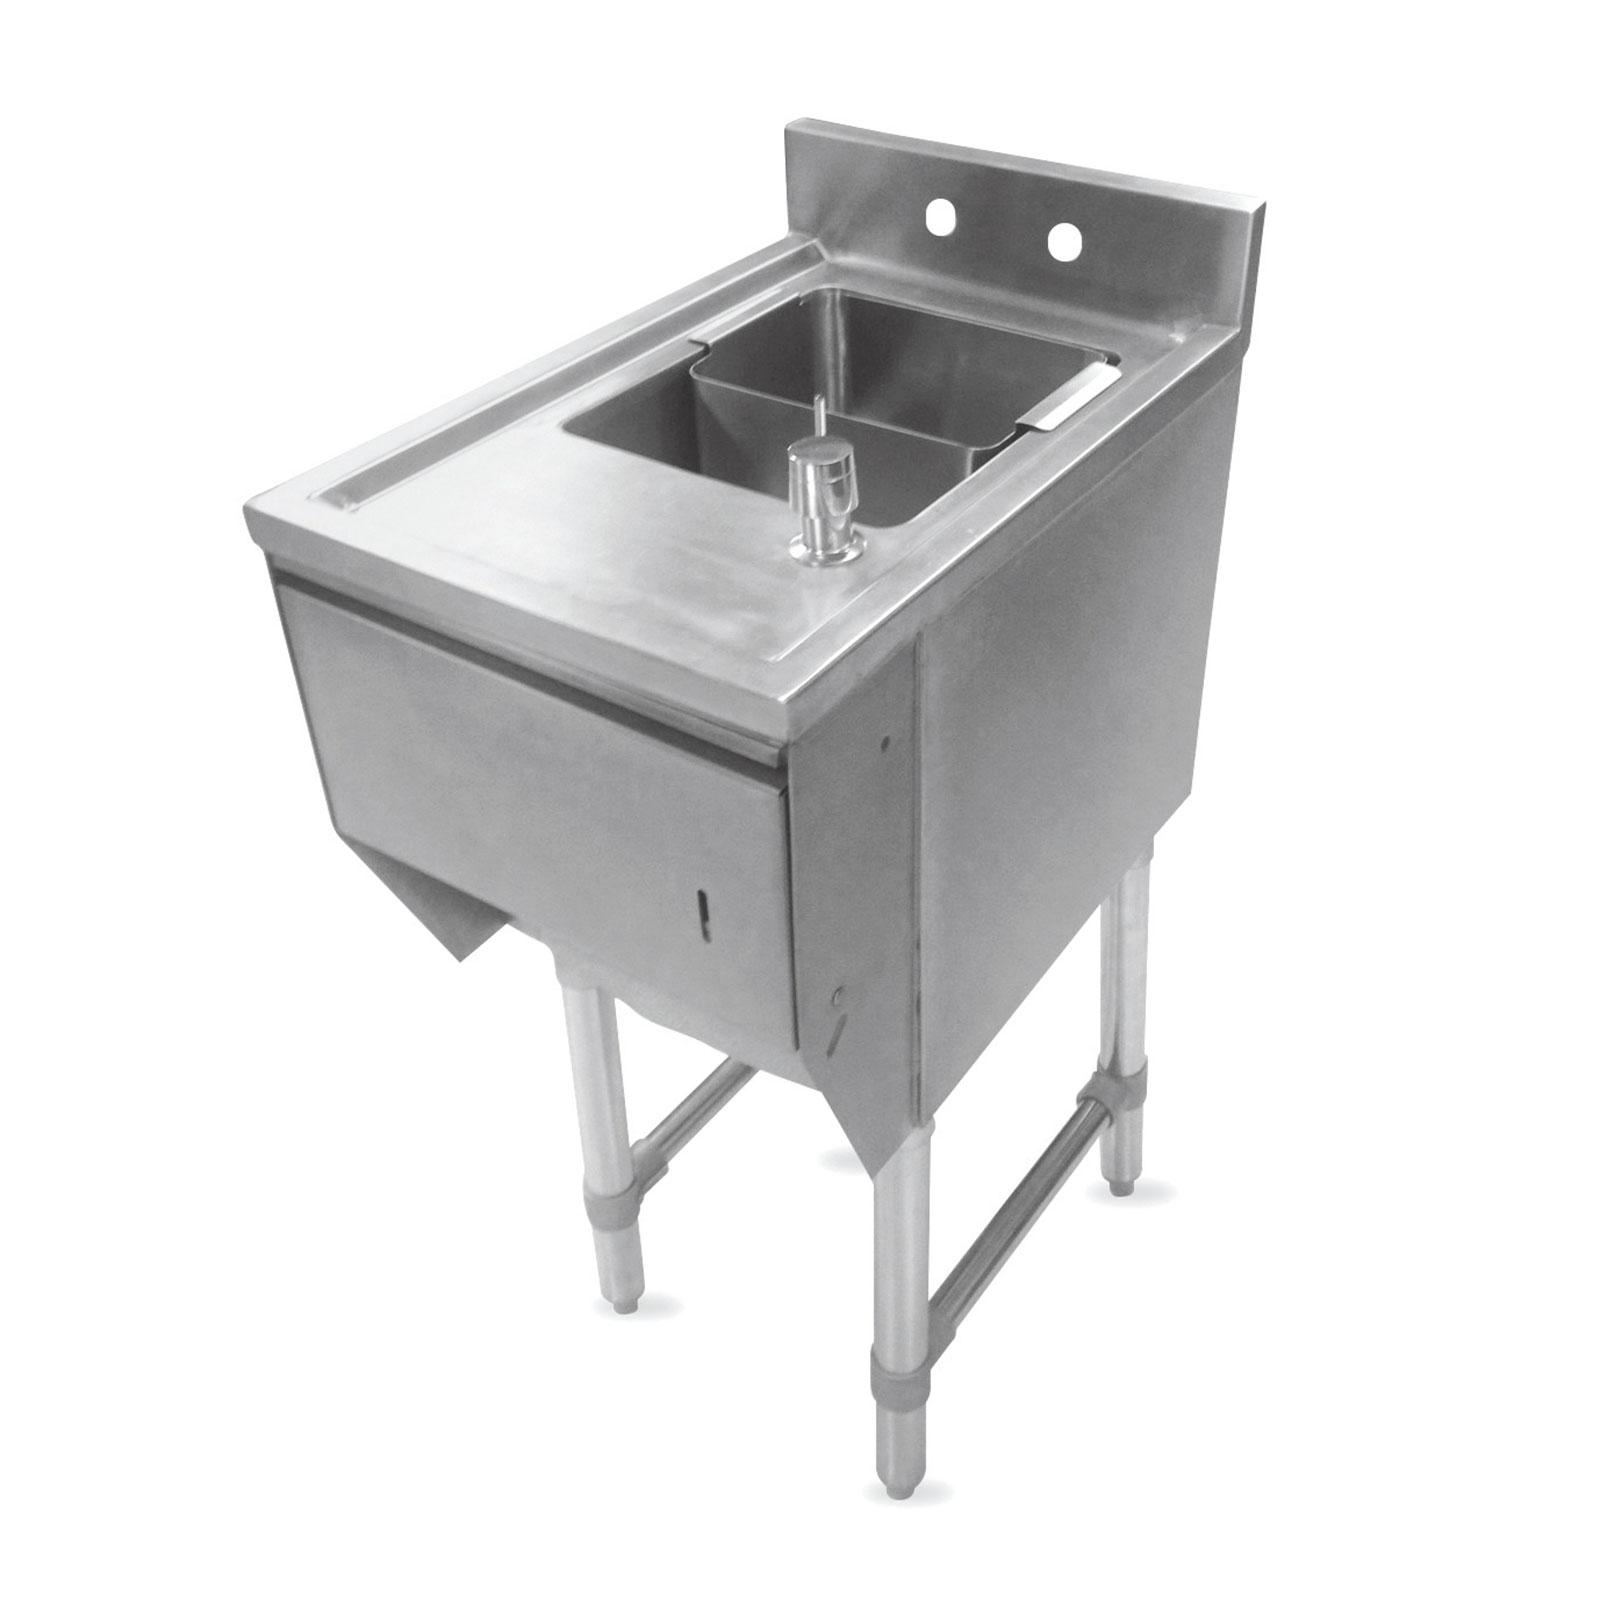 John Boos EUBDS-1521STD underbar sink units